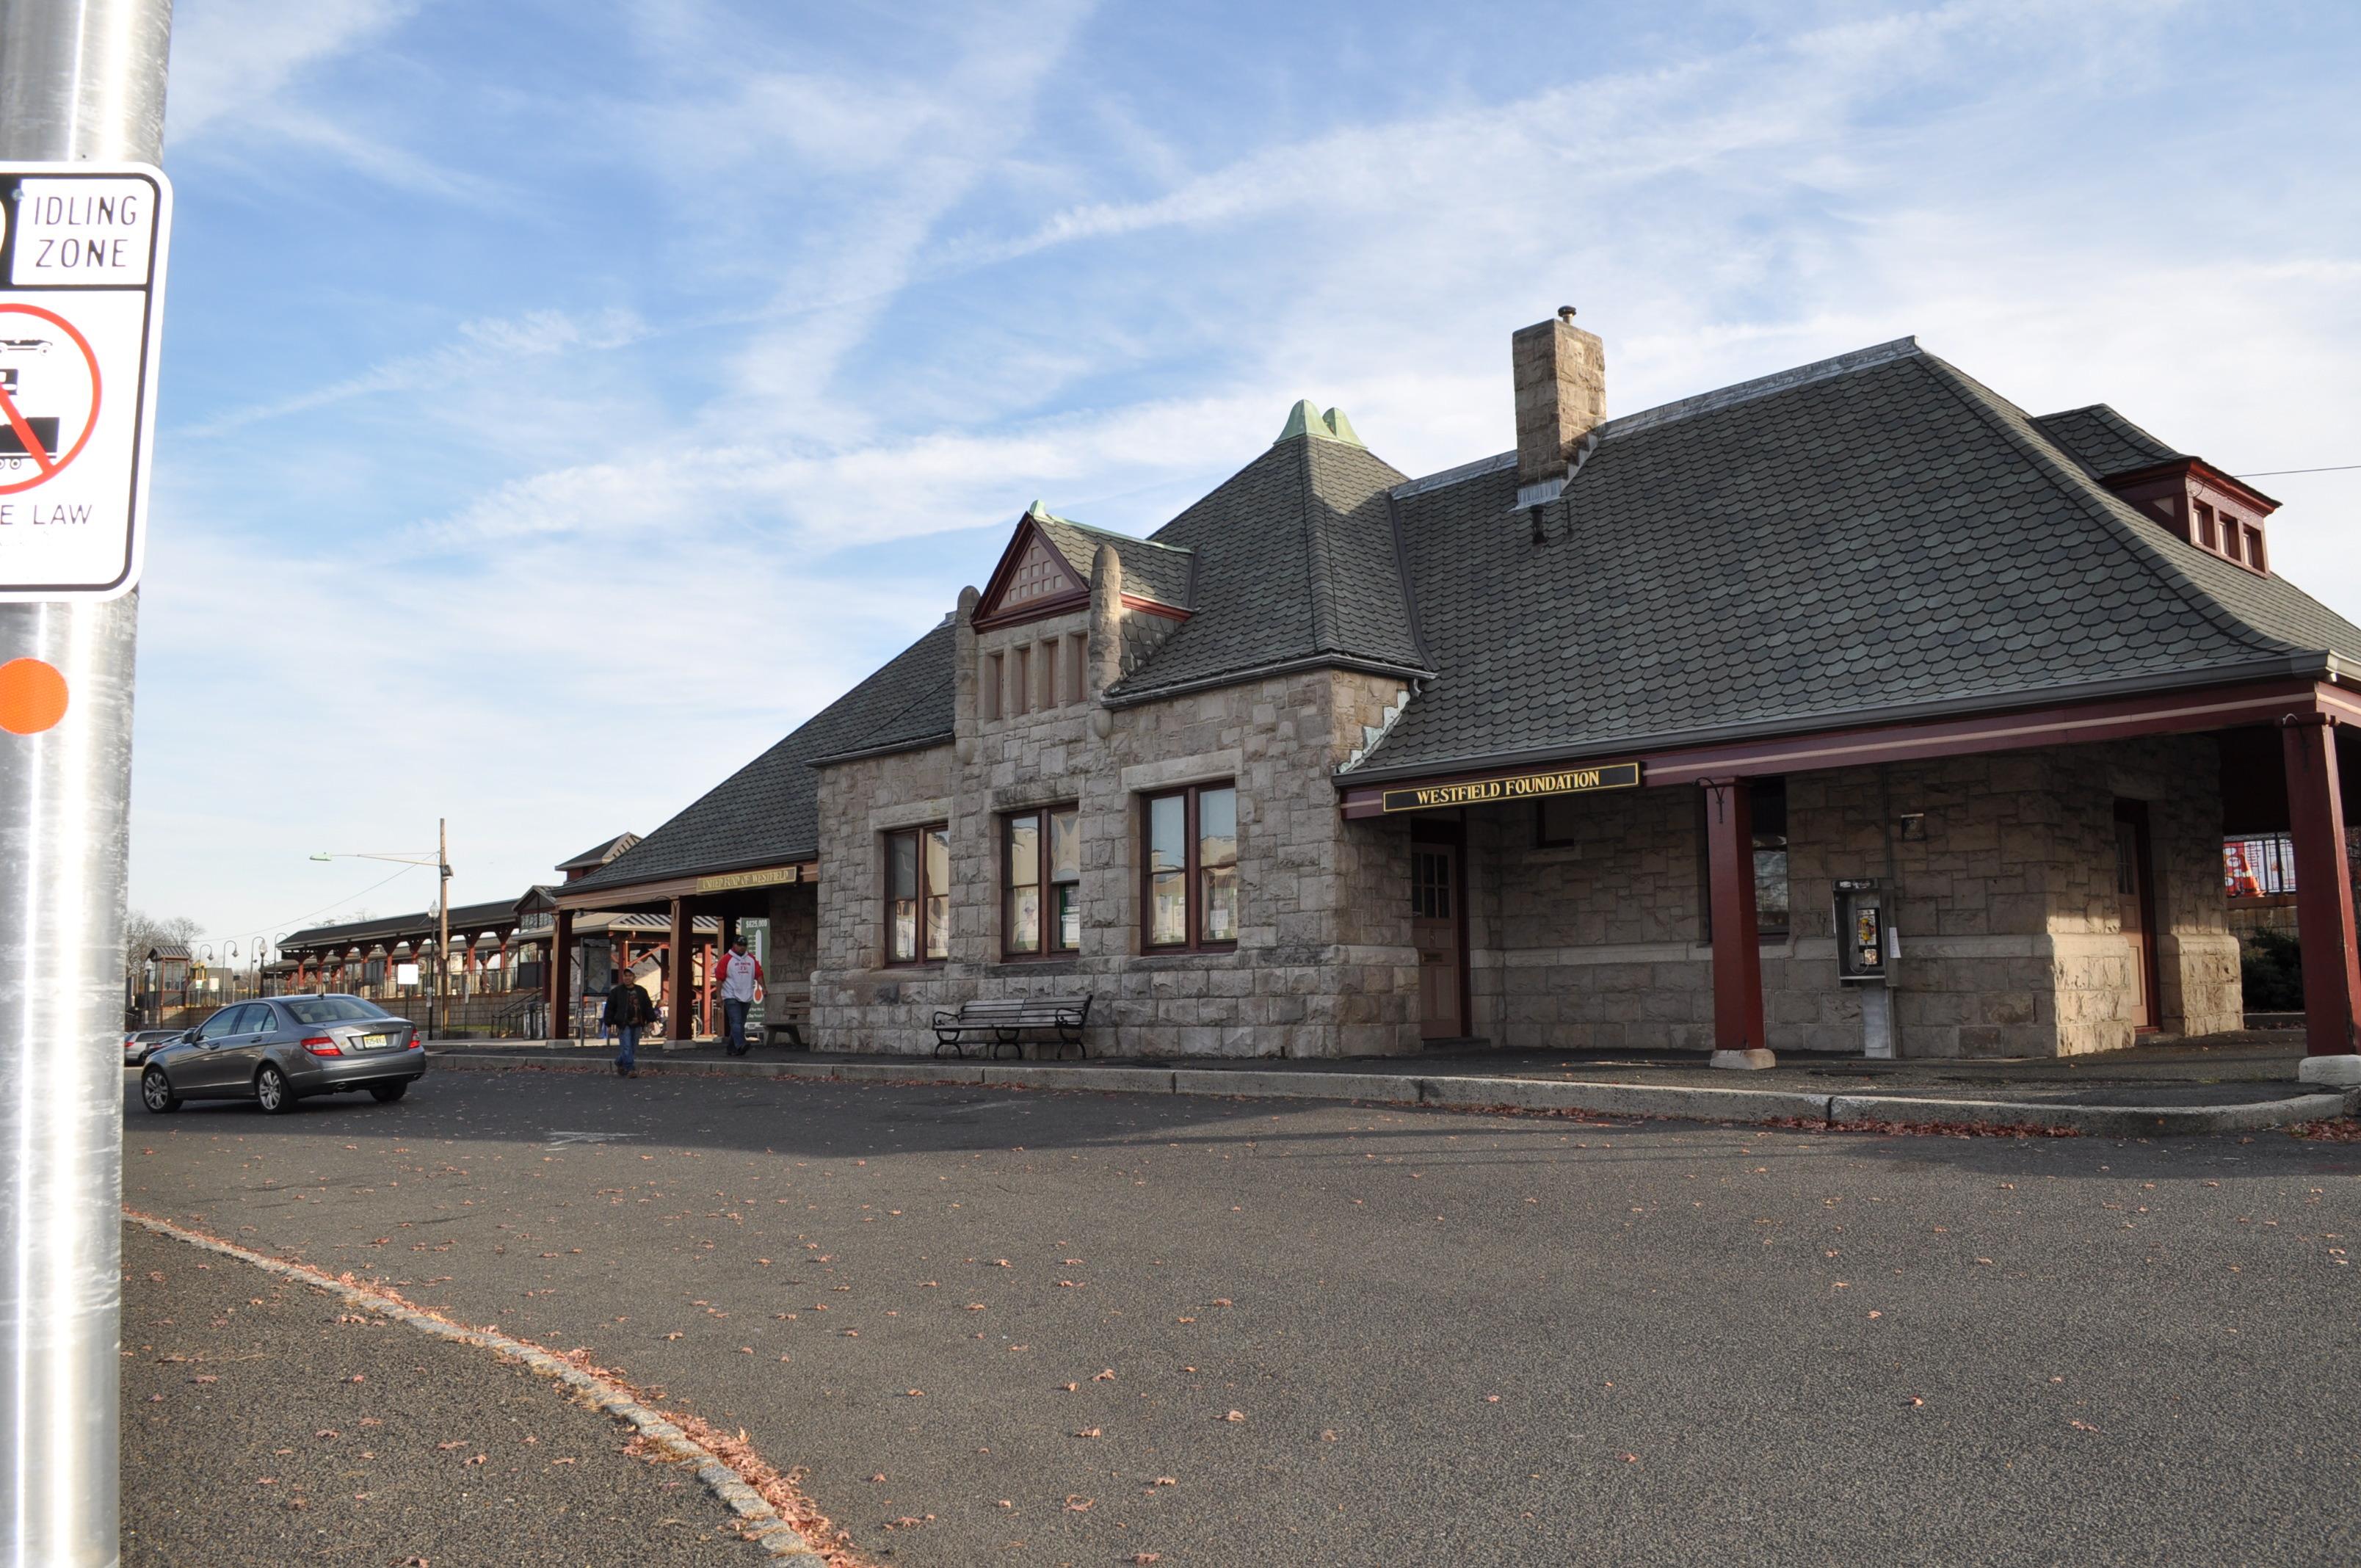 41cea0690aca547aed0e_train_station.JPG